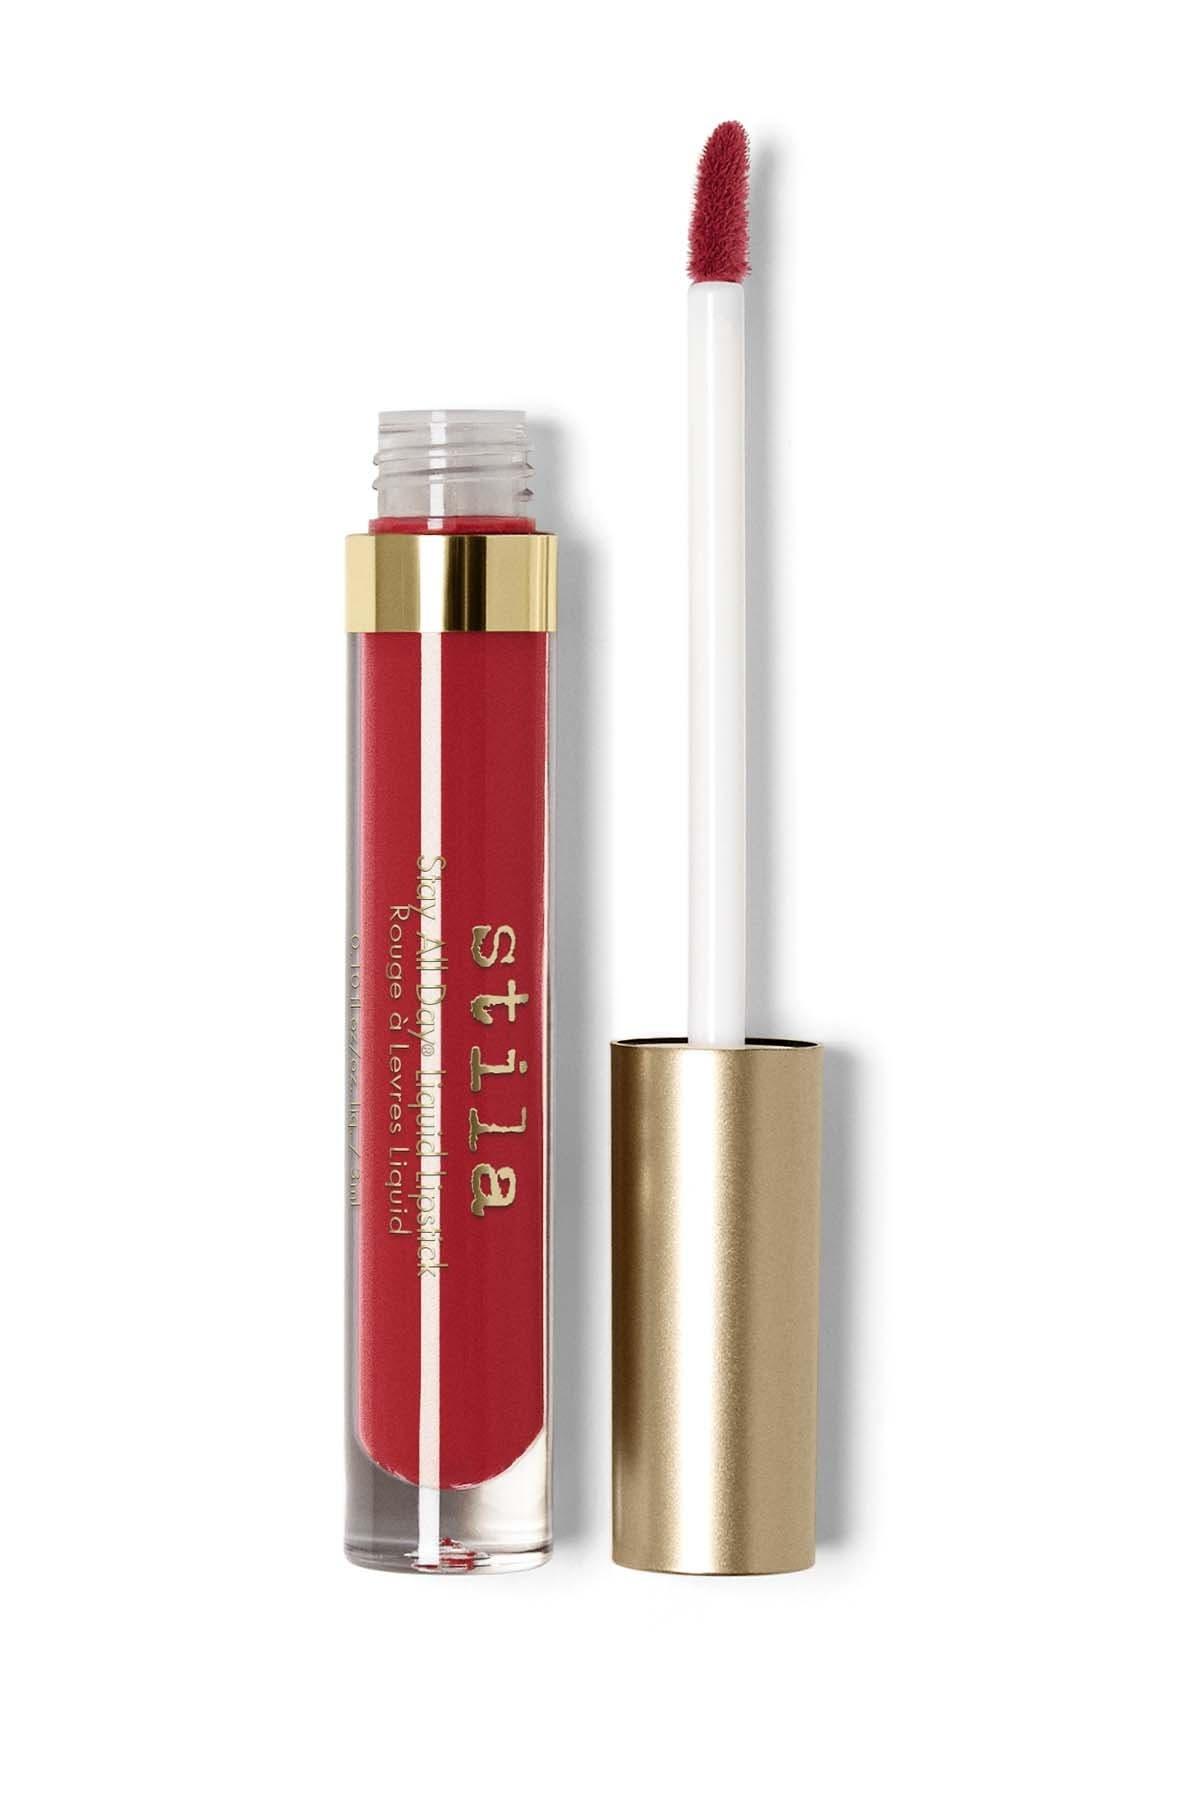 Image of Stila Stay All Day Liquid Lipstick - Sheer Beso